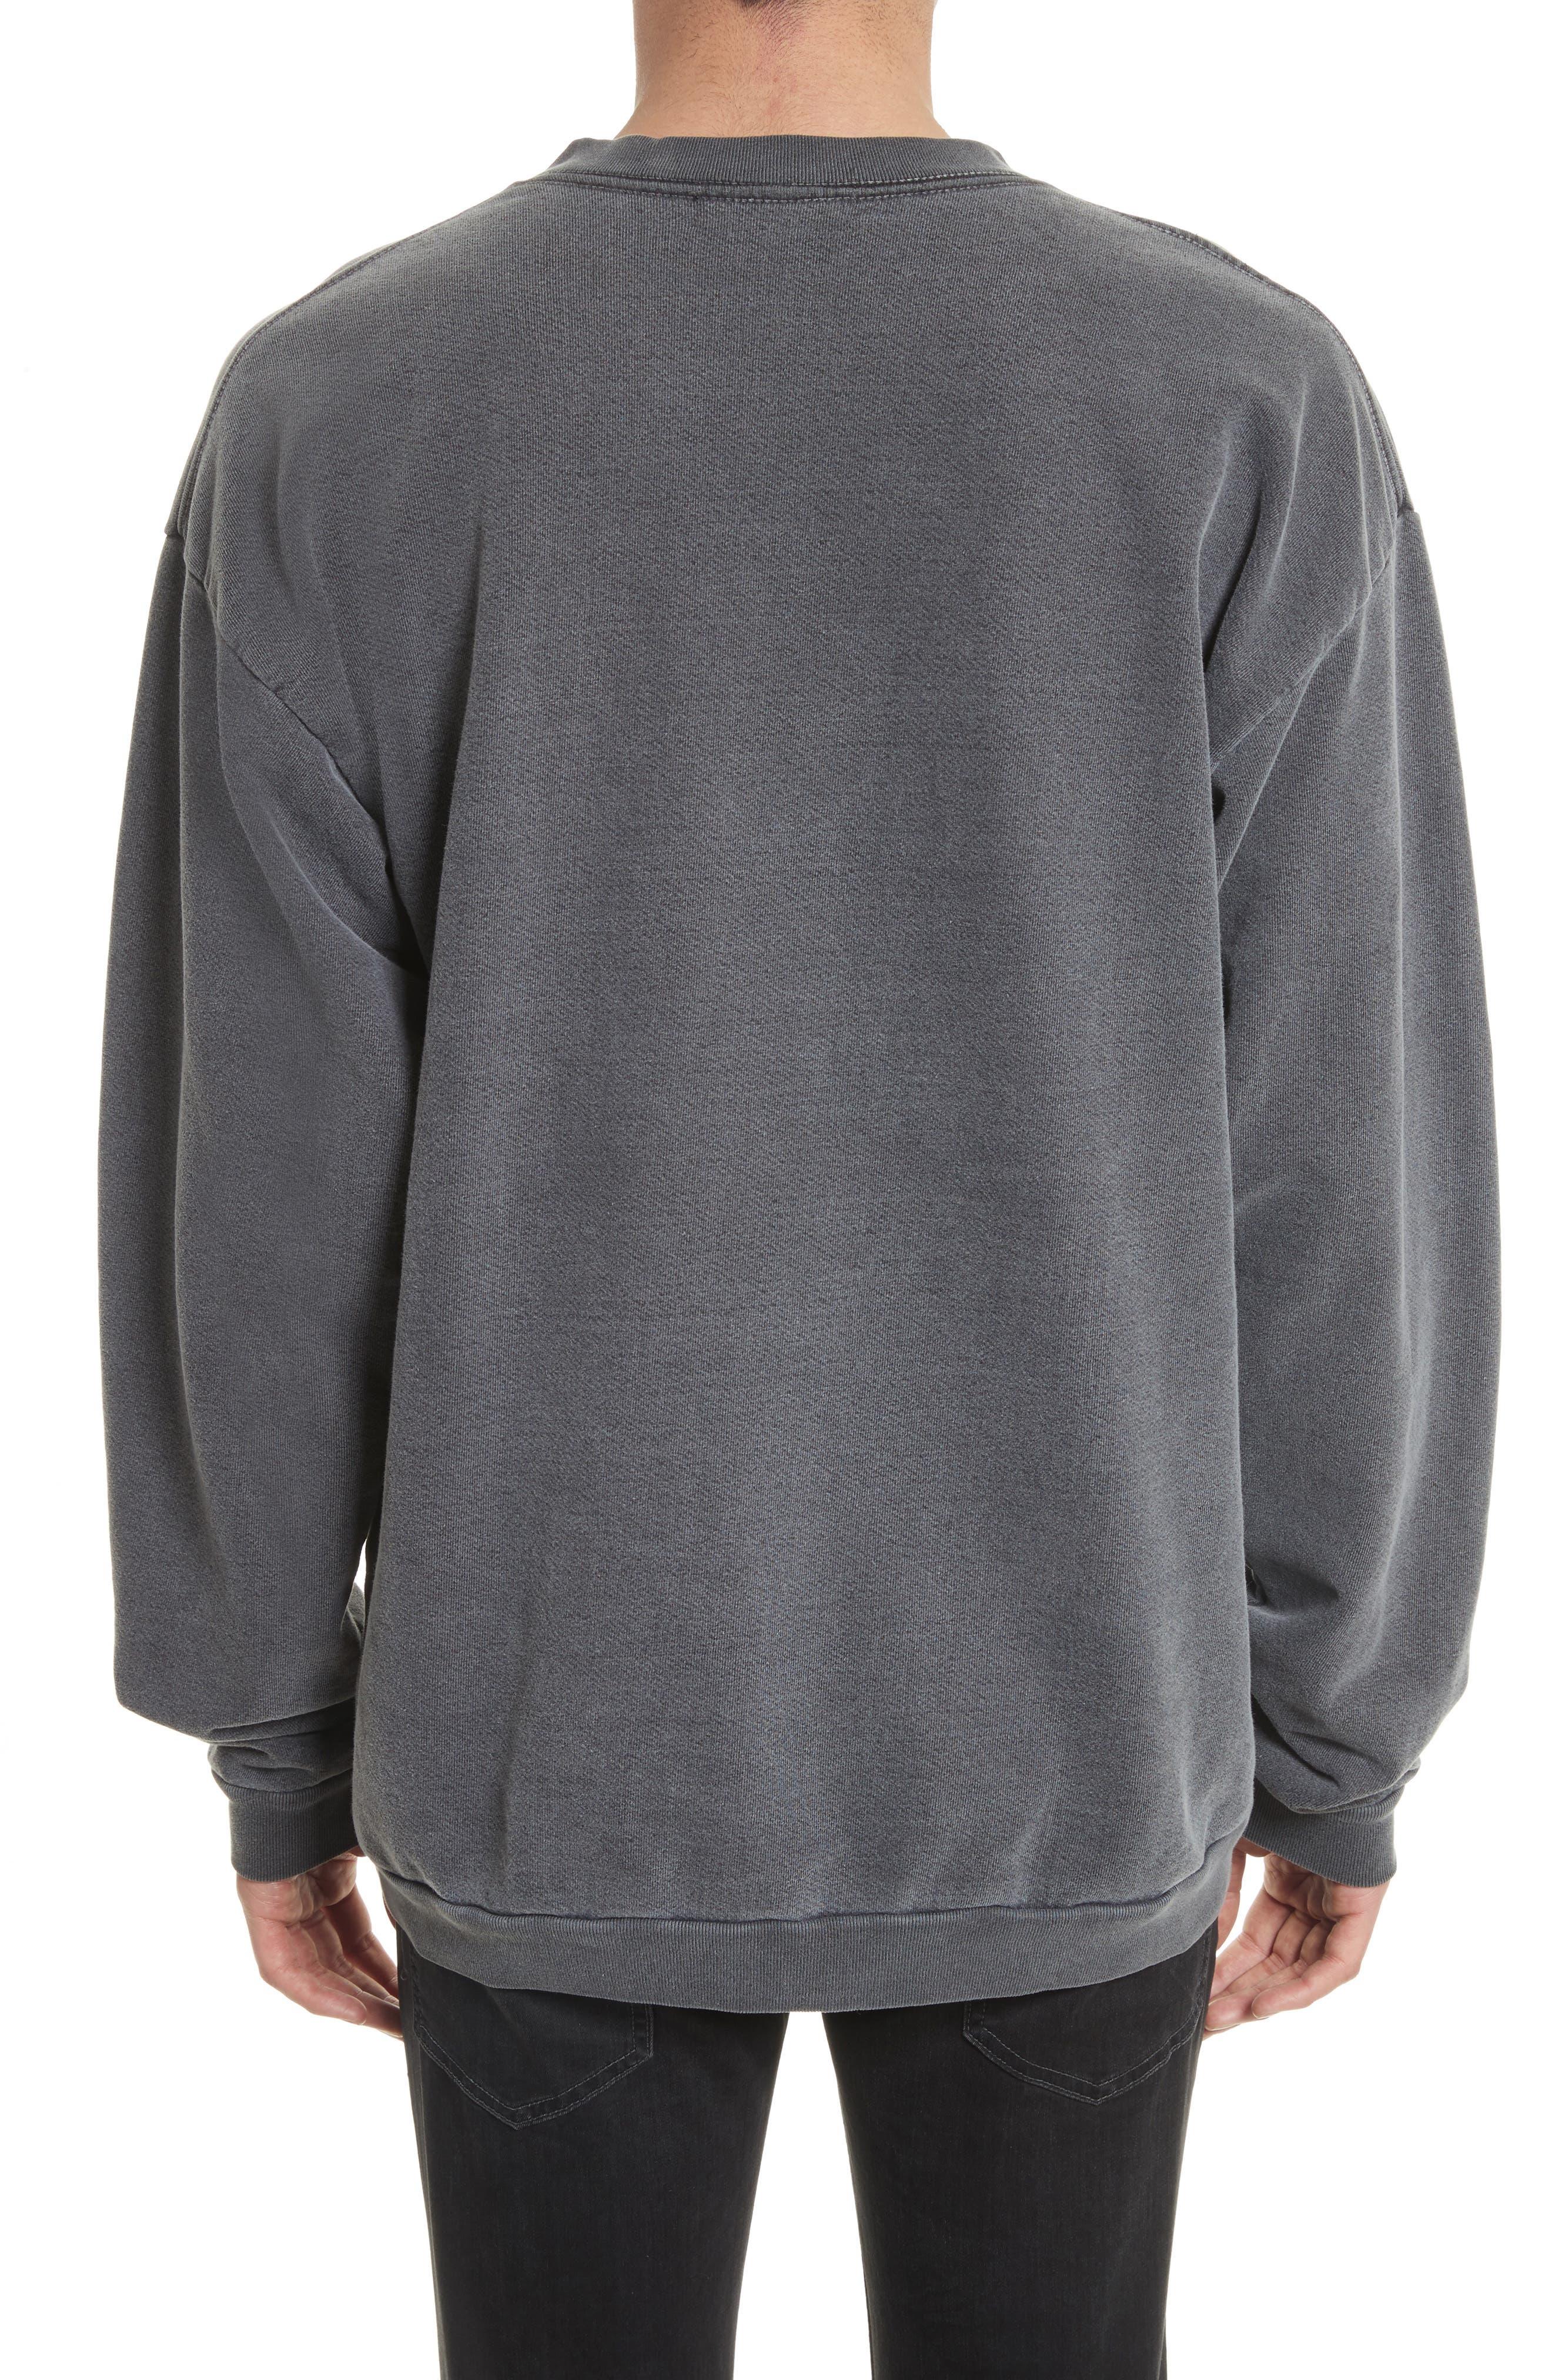 Norton Sweatshirt,                             Alternate thumbnail 2, color,                             Black Pigment